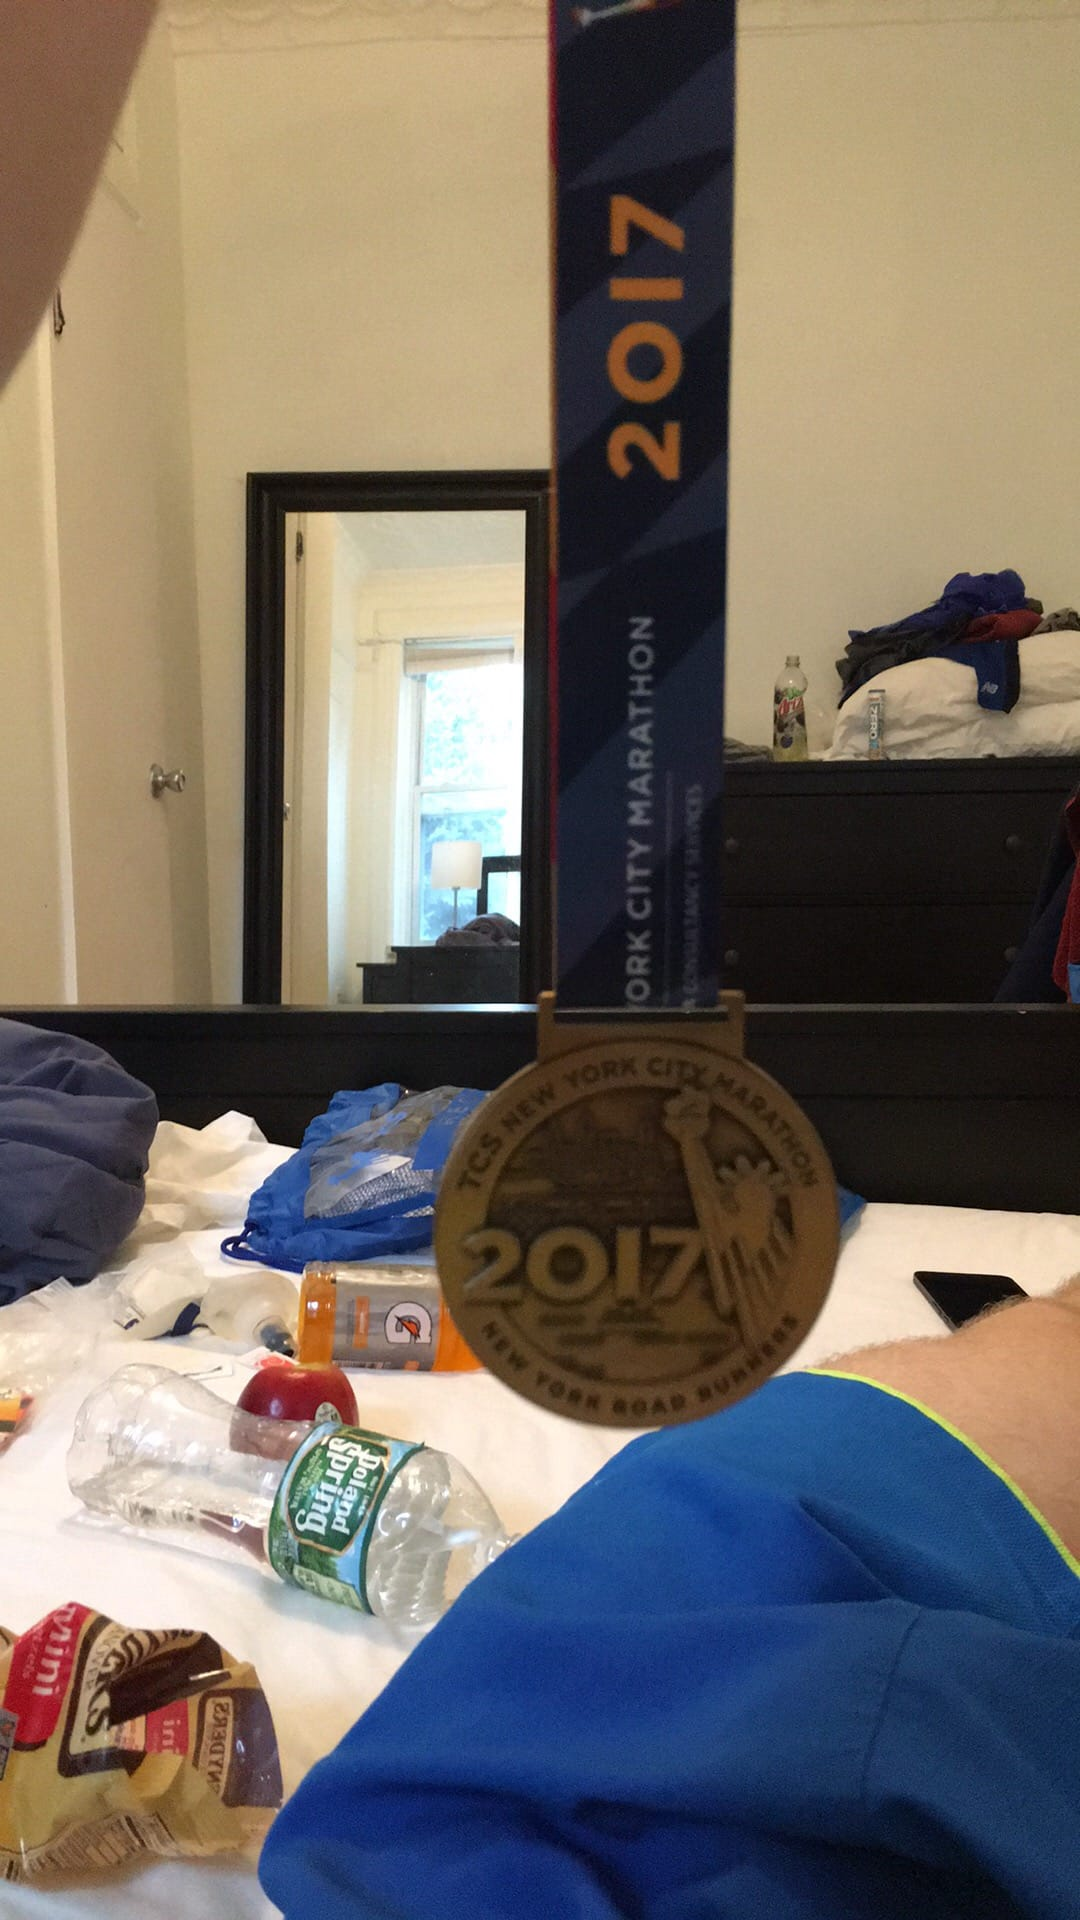 My NYC Marathon medal